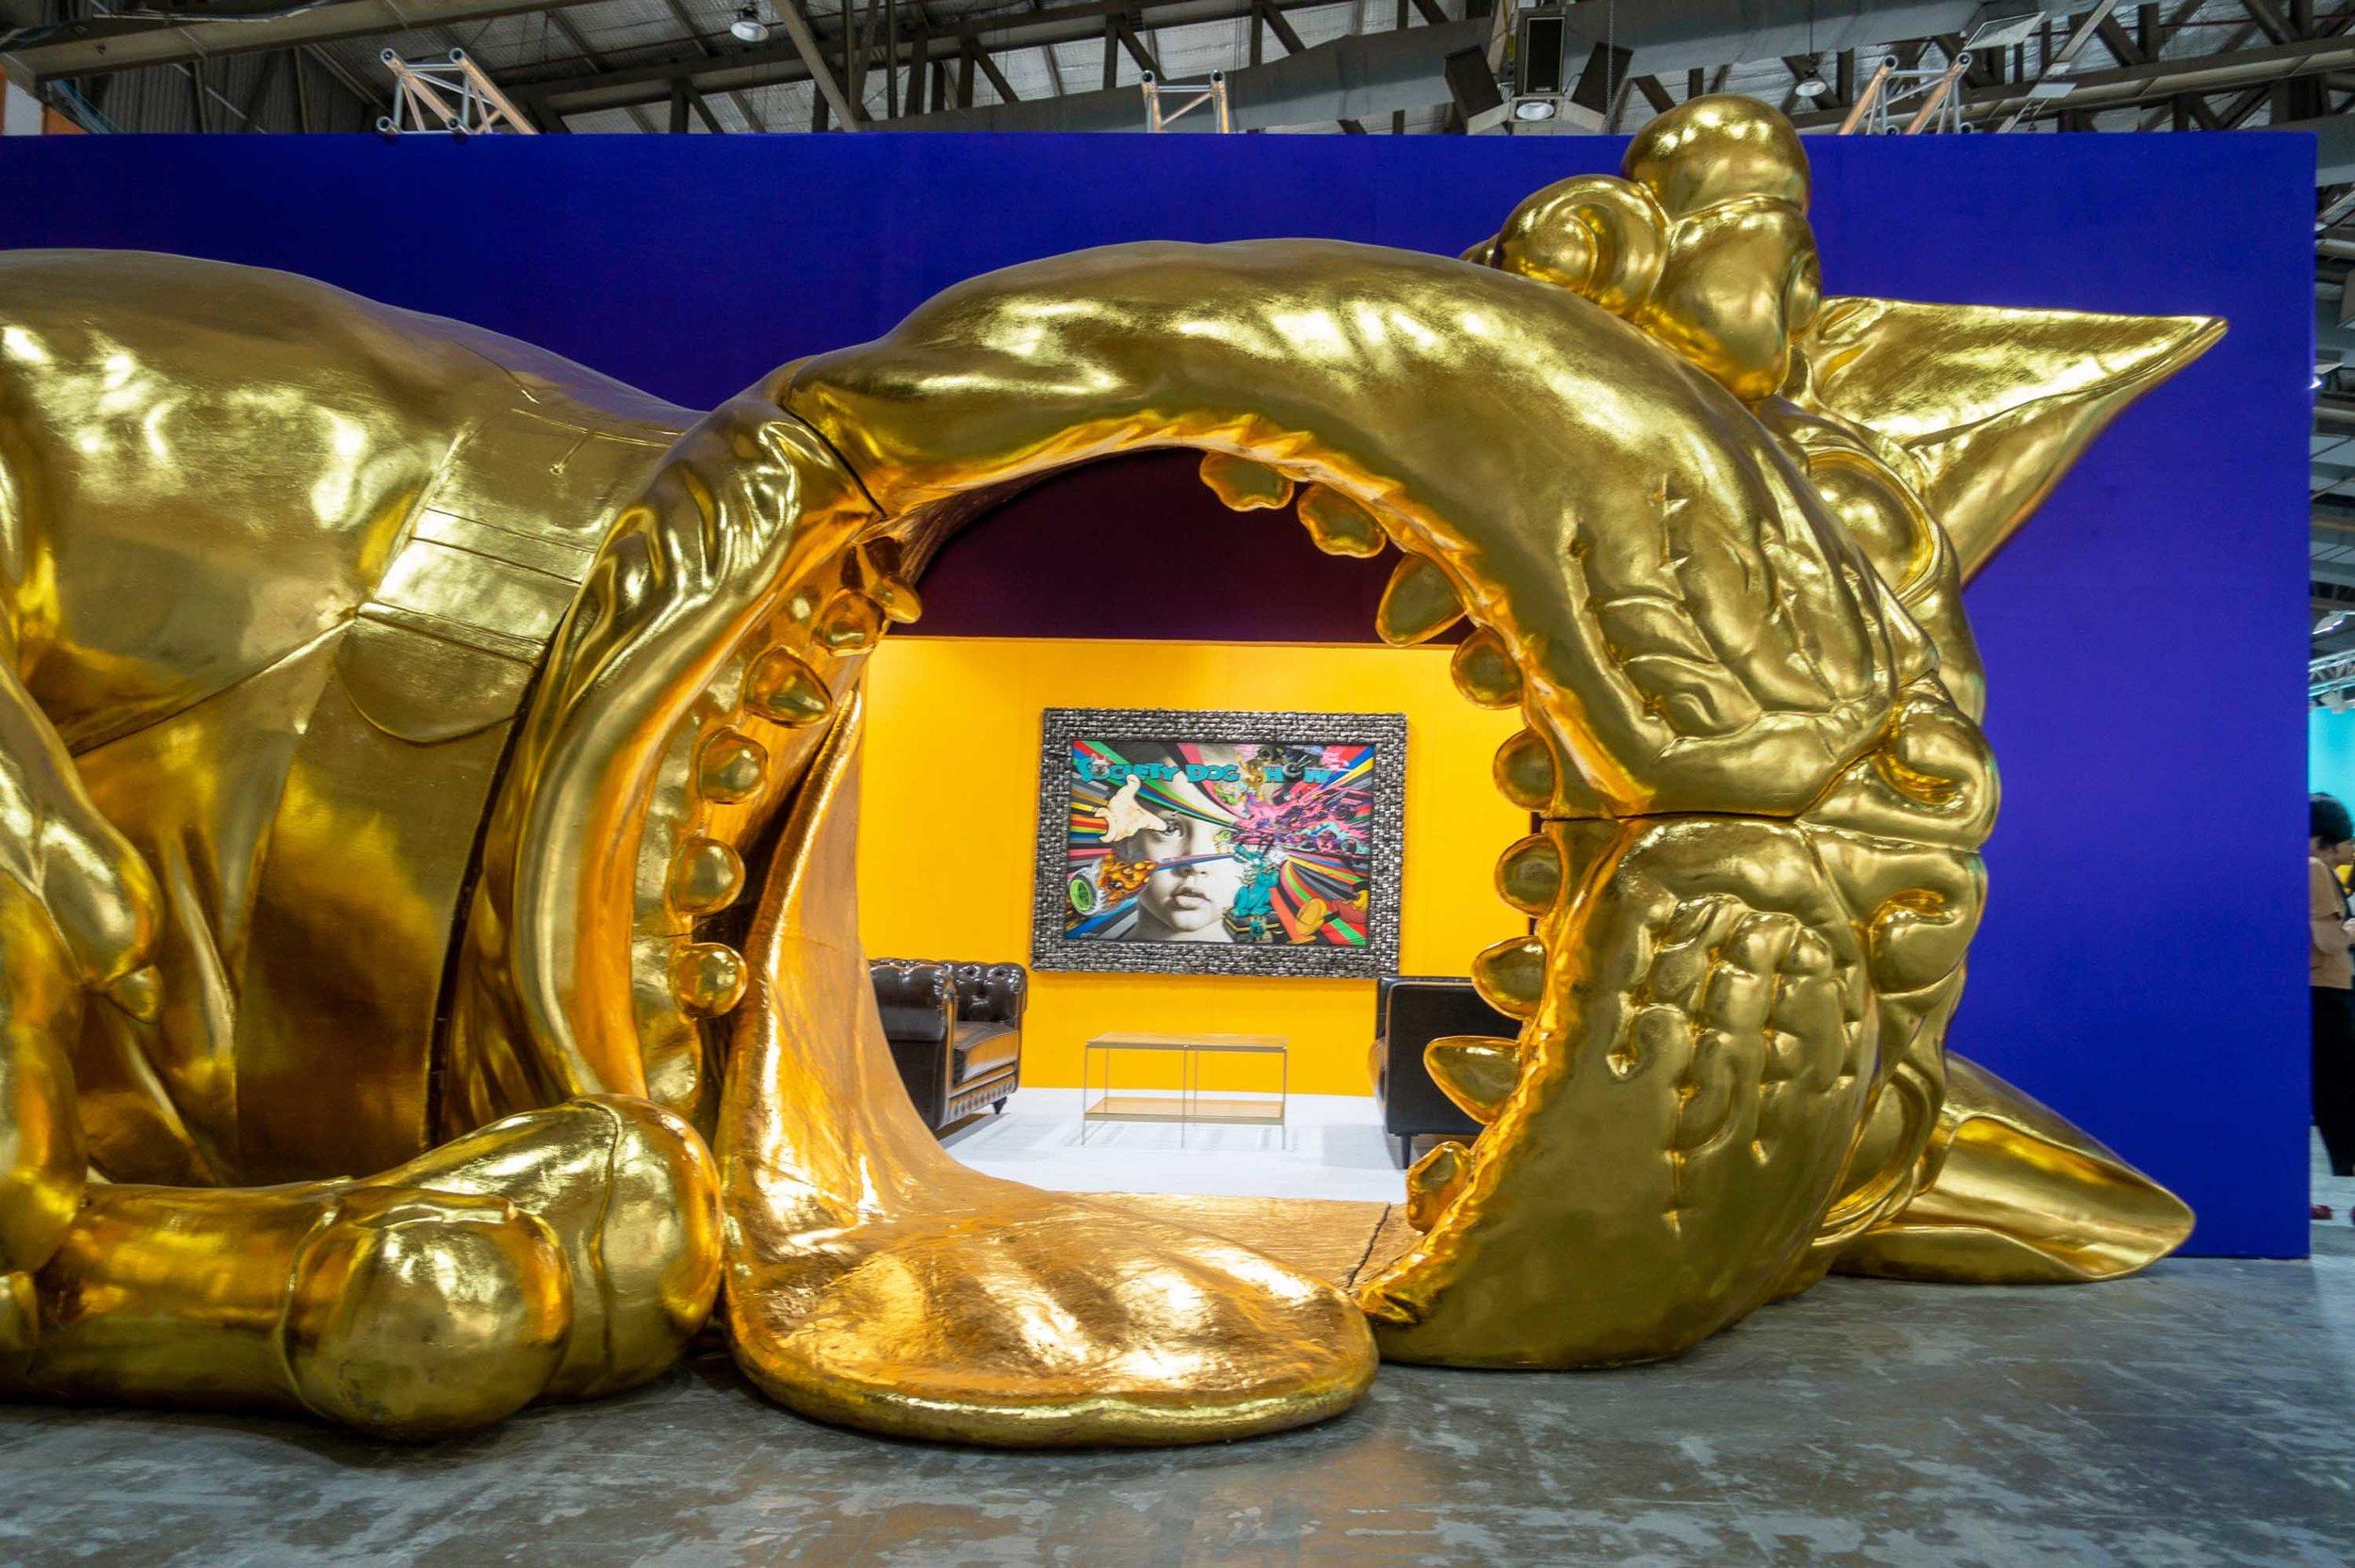 Ronald Ventura, 'Bobro's World Tour Jakarta', 2019, installation view. Presented by Yavuz Gallery as part of Art Jakarta Spot. Image courtesy of Yavuz Gallery.